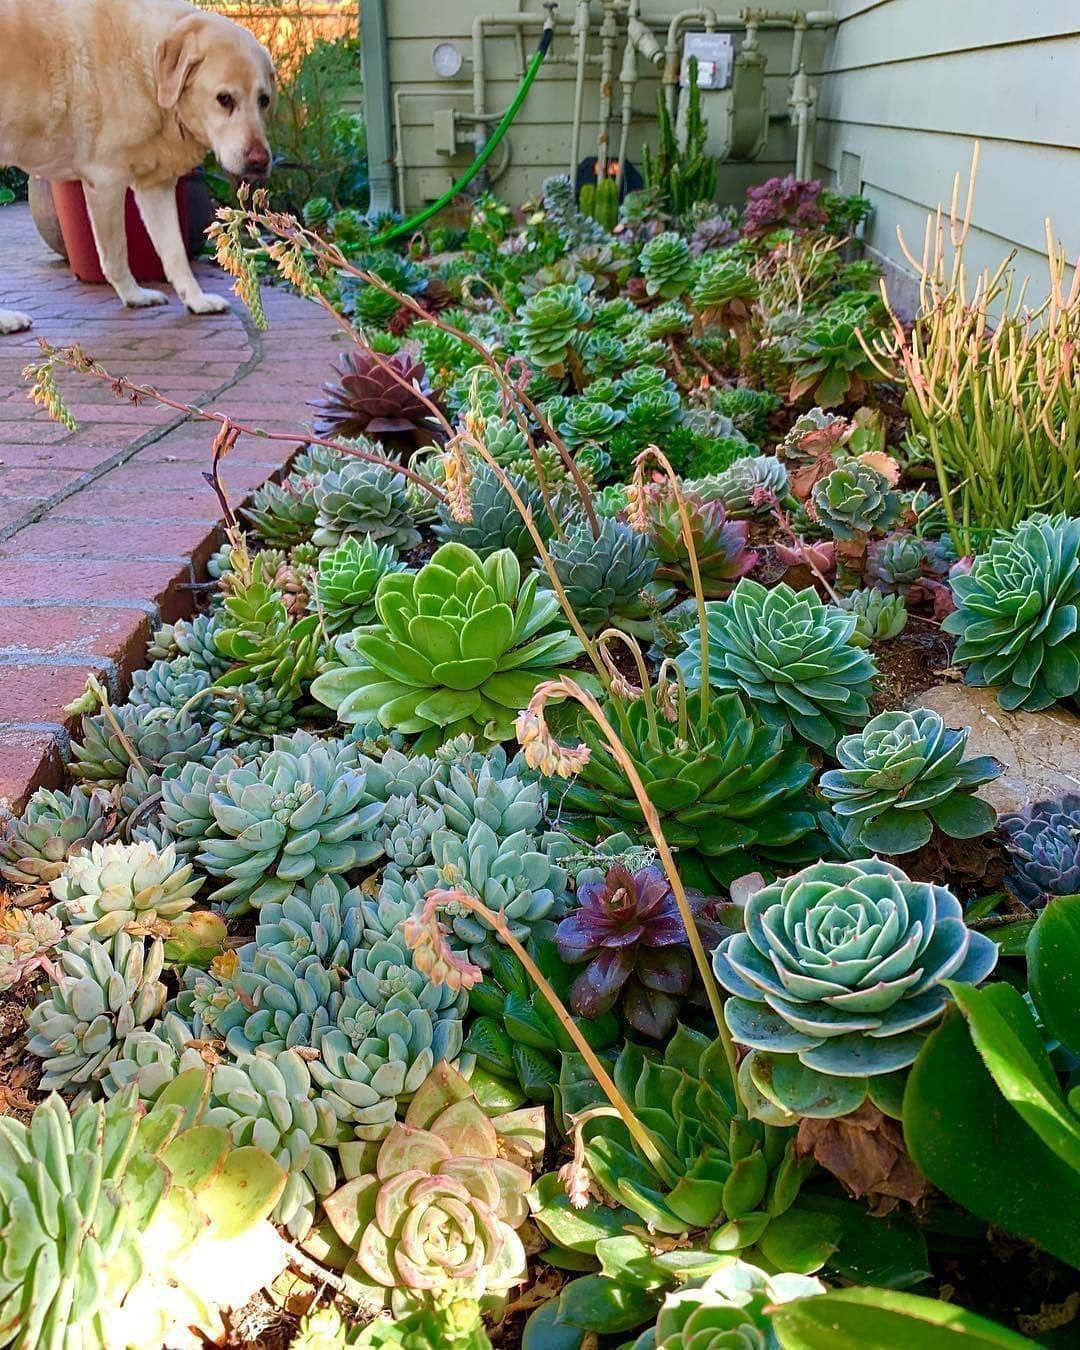 Olivra Homedecor On Instagram Outdoor Succulent Garden Arrangement Share With One Of Your Frien Succulent Garden Outdoor Succulents Succulent Garden Design